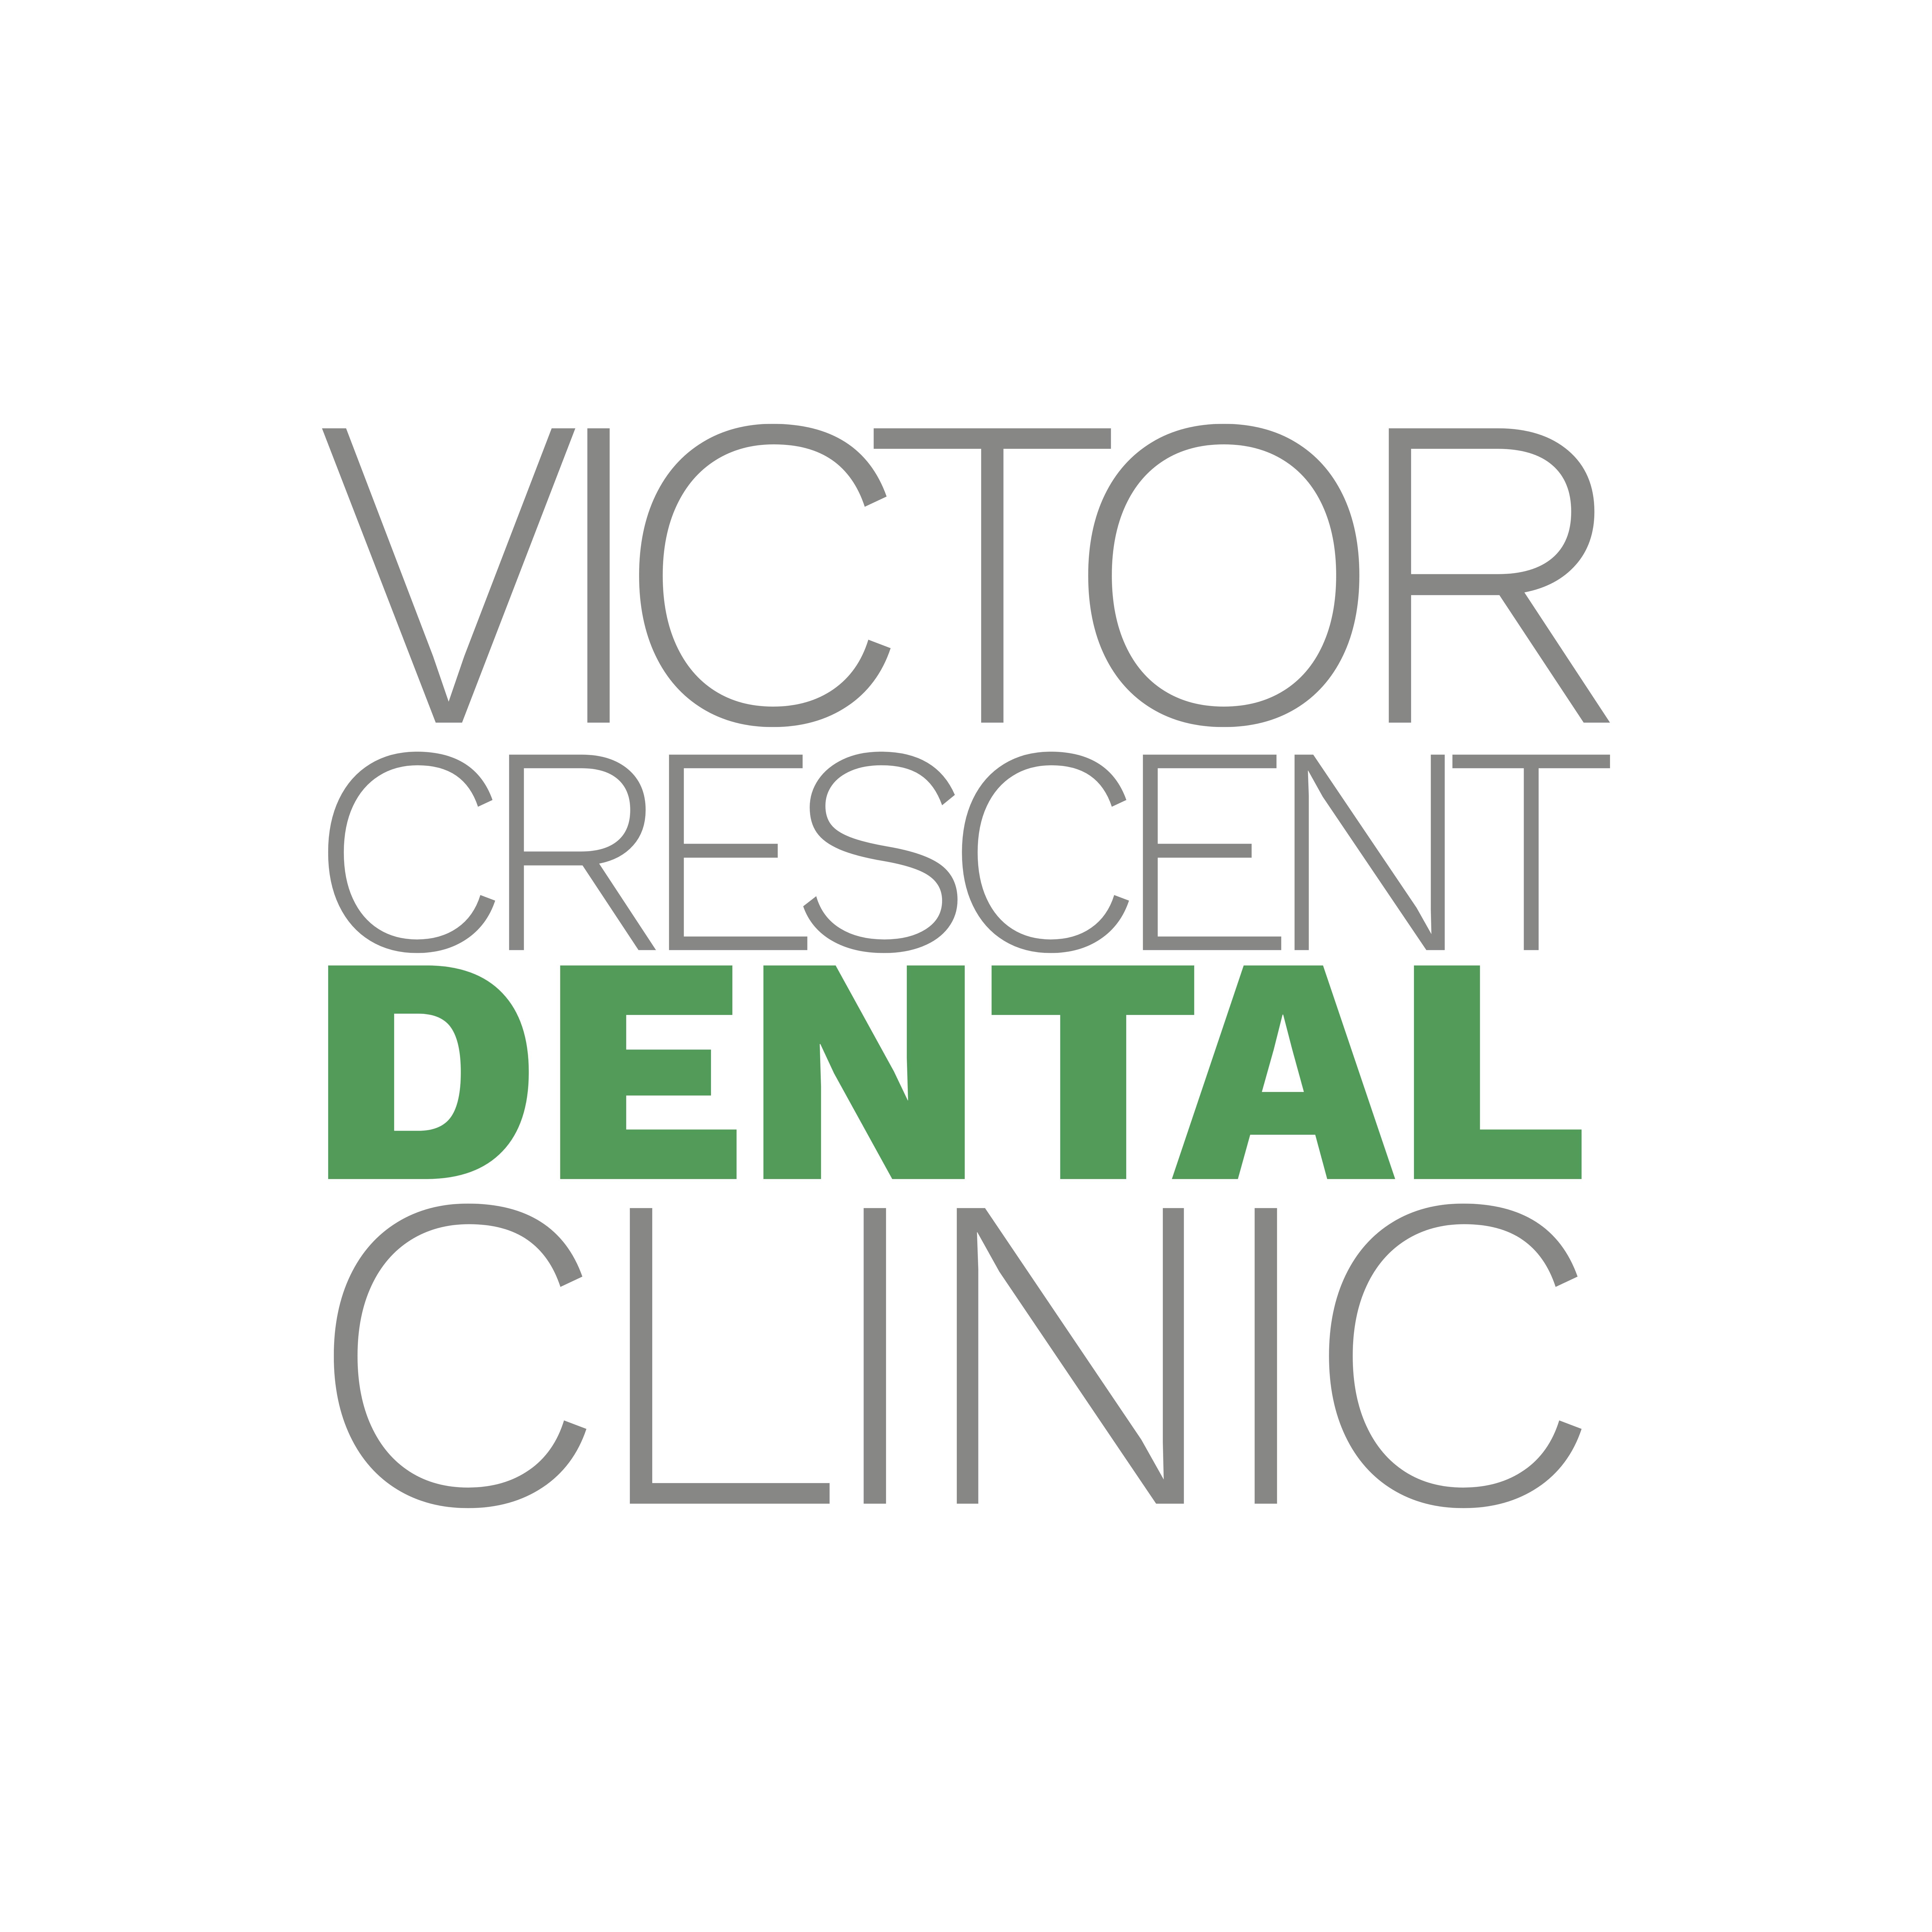 Victor Crescent Dental Clinic